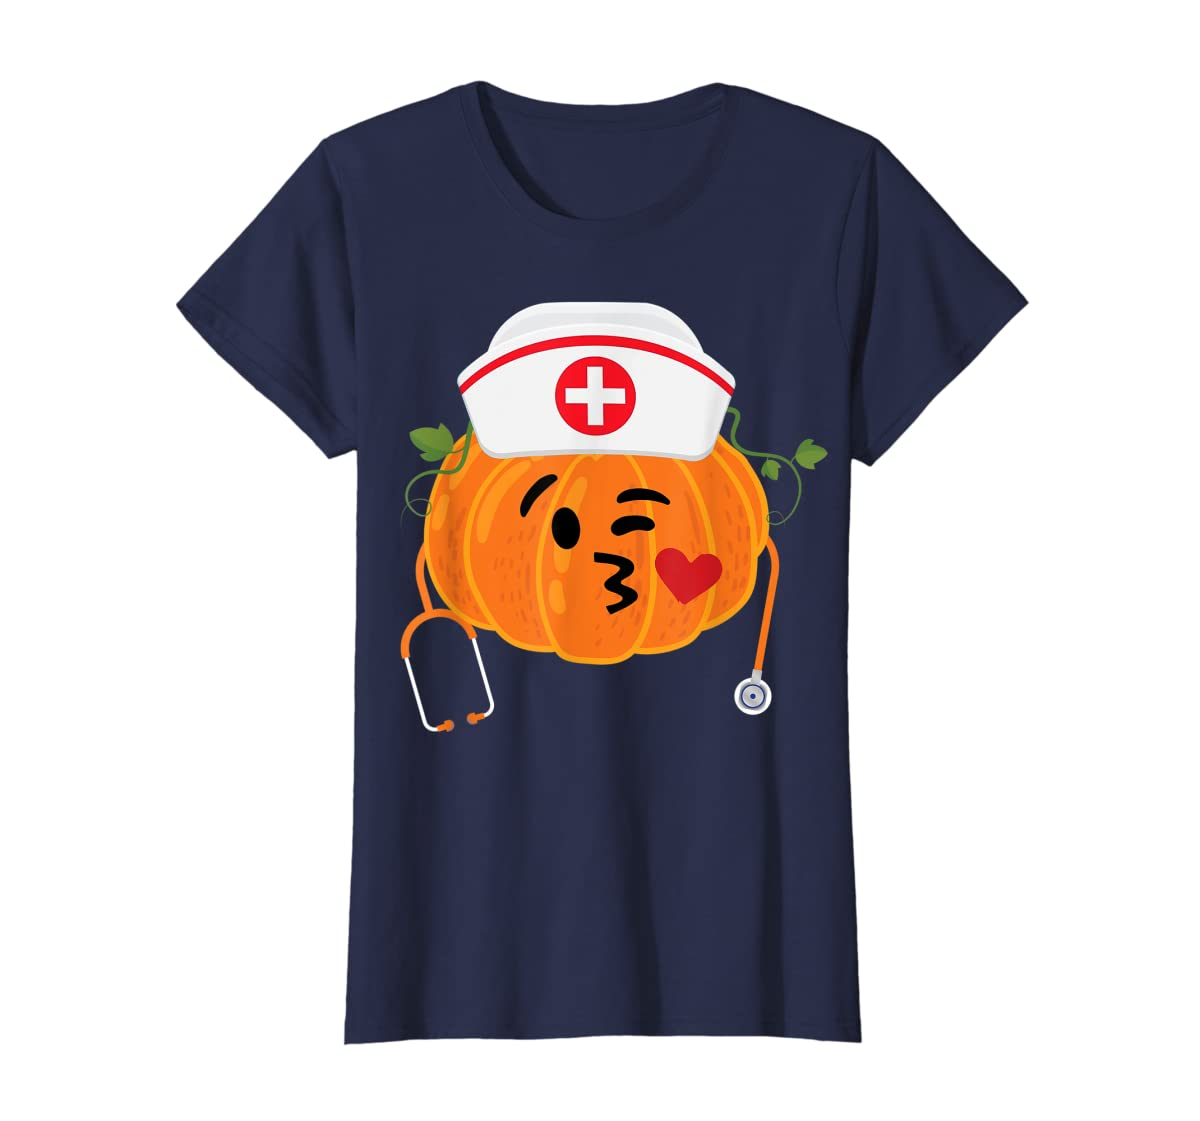 Nurse Stethoscope Pumpkin Funny Nursing Halloween Gift T-Shirt-Women's T-Shirt-Navy